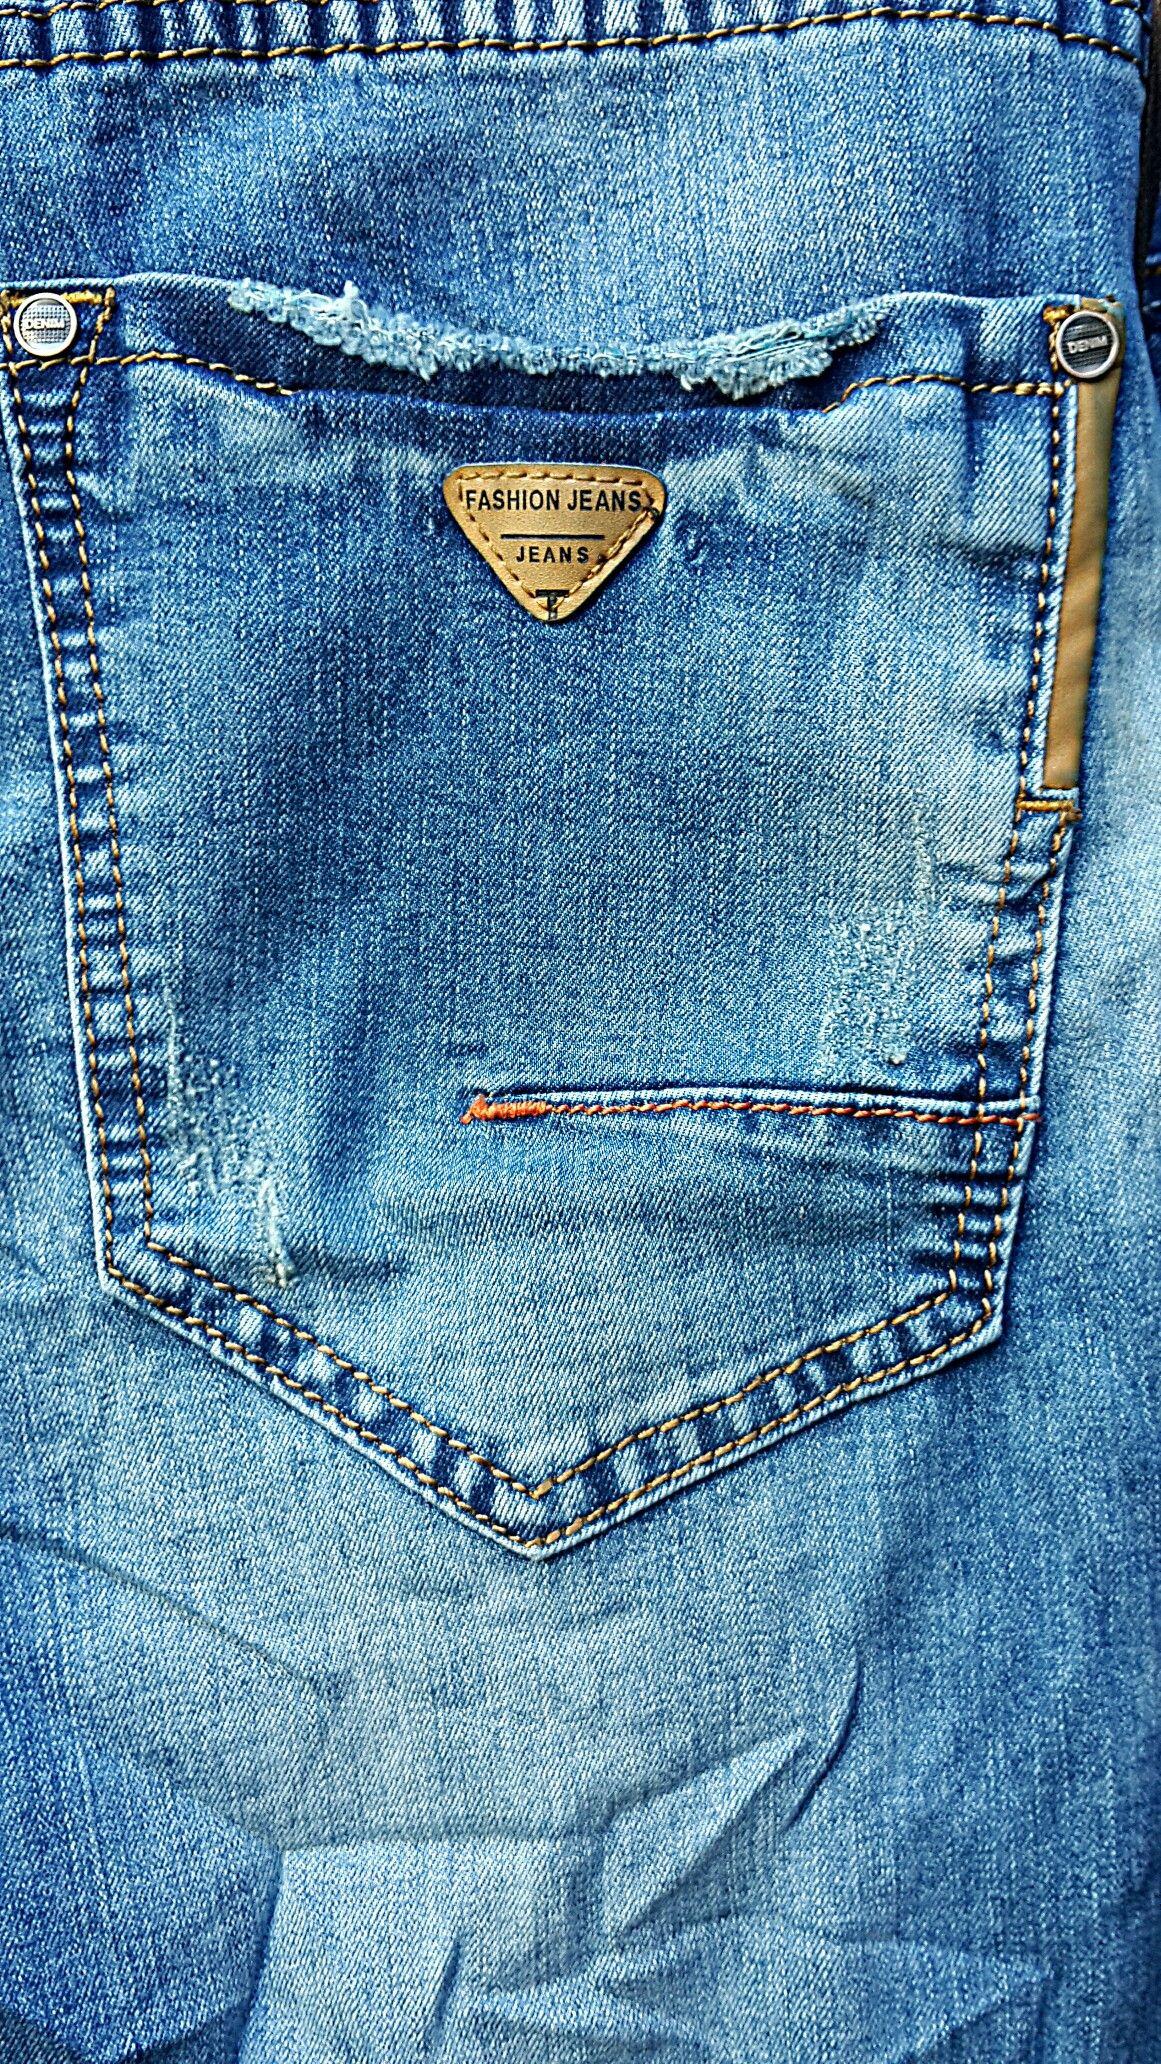 Pin De Jorge Azurdia En Pocket Jeans Para Hombre Pantalones De Caballeros Jeans De Moda